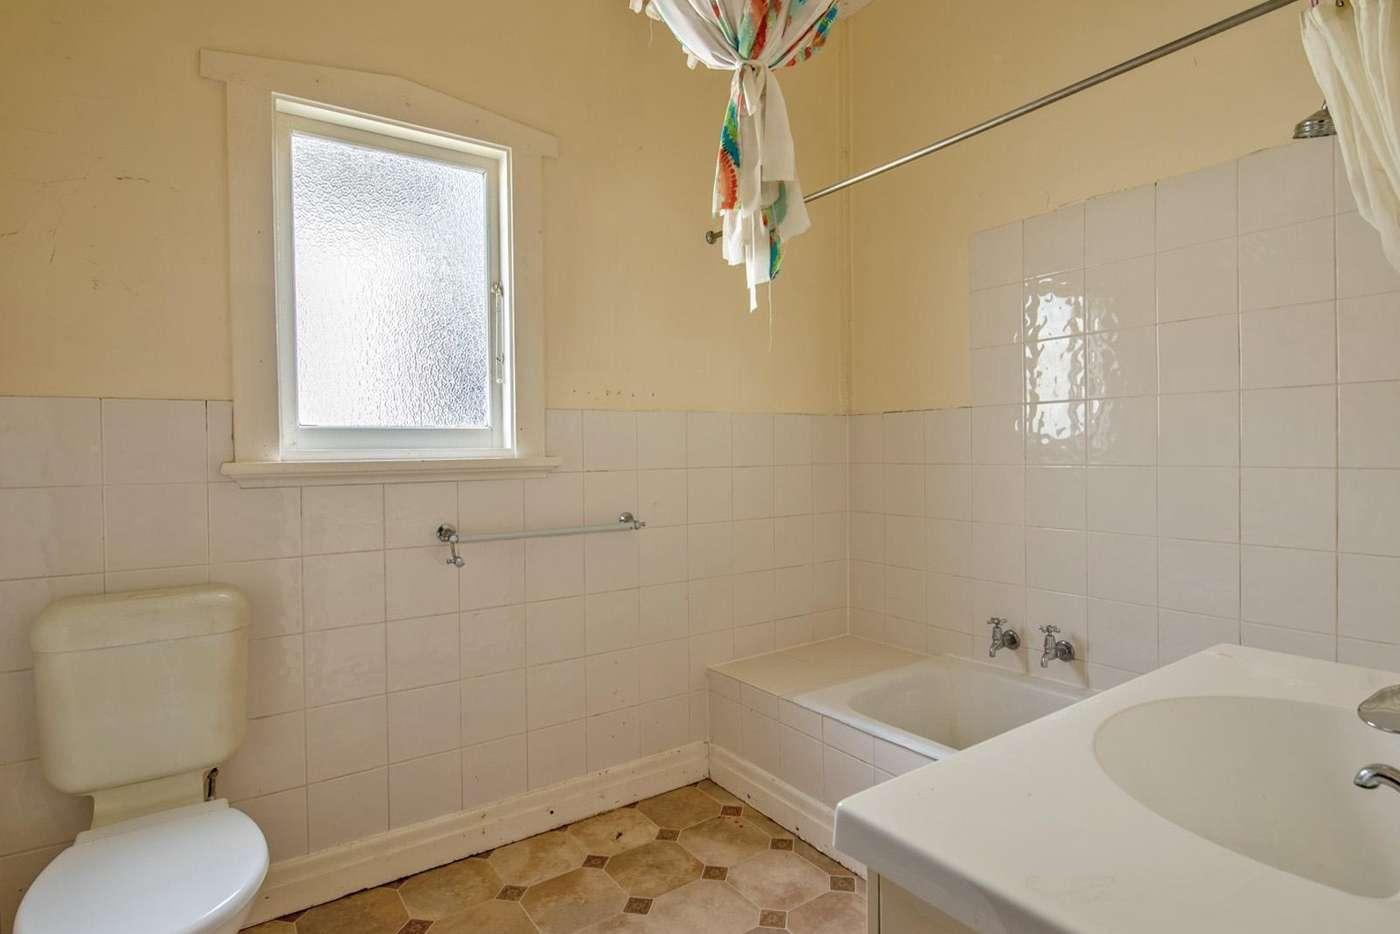 Sixth view of Homely house listing, 18 Albert Street, Sebastopol VIC 3356